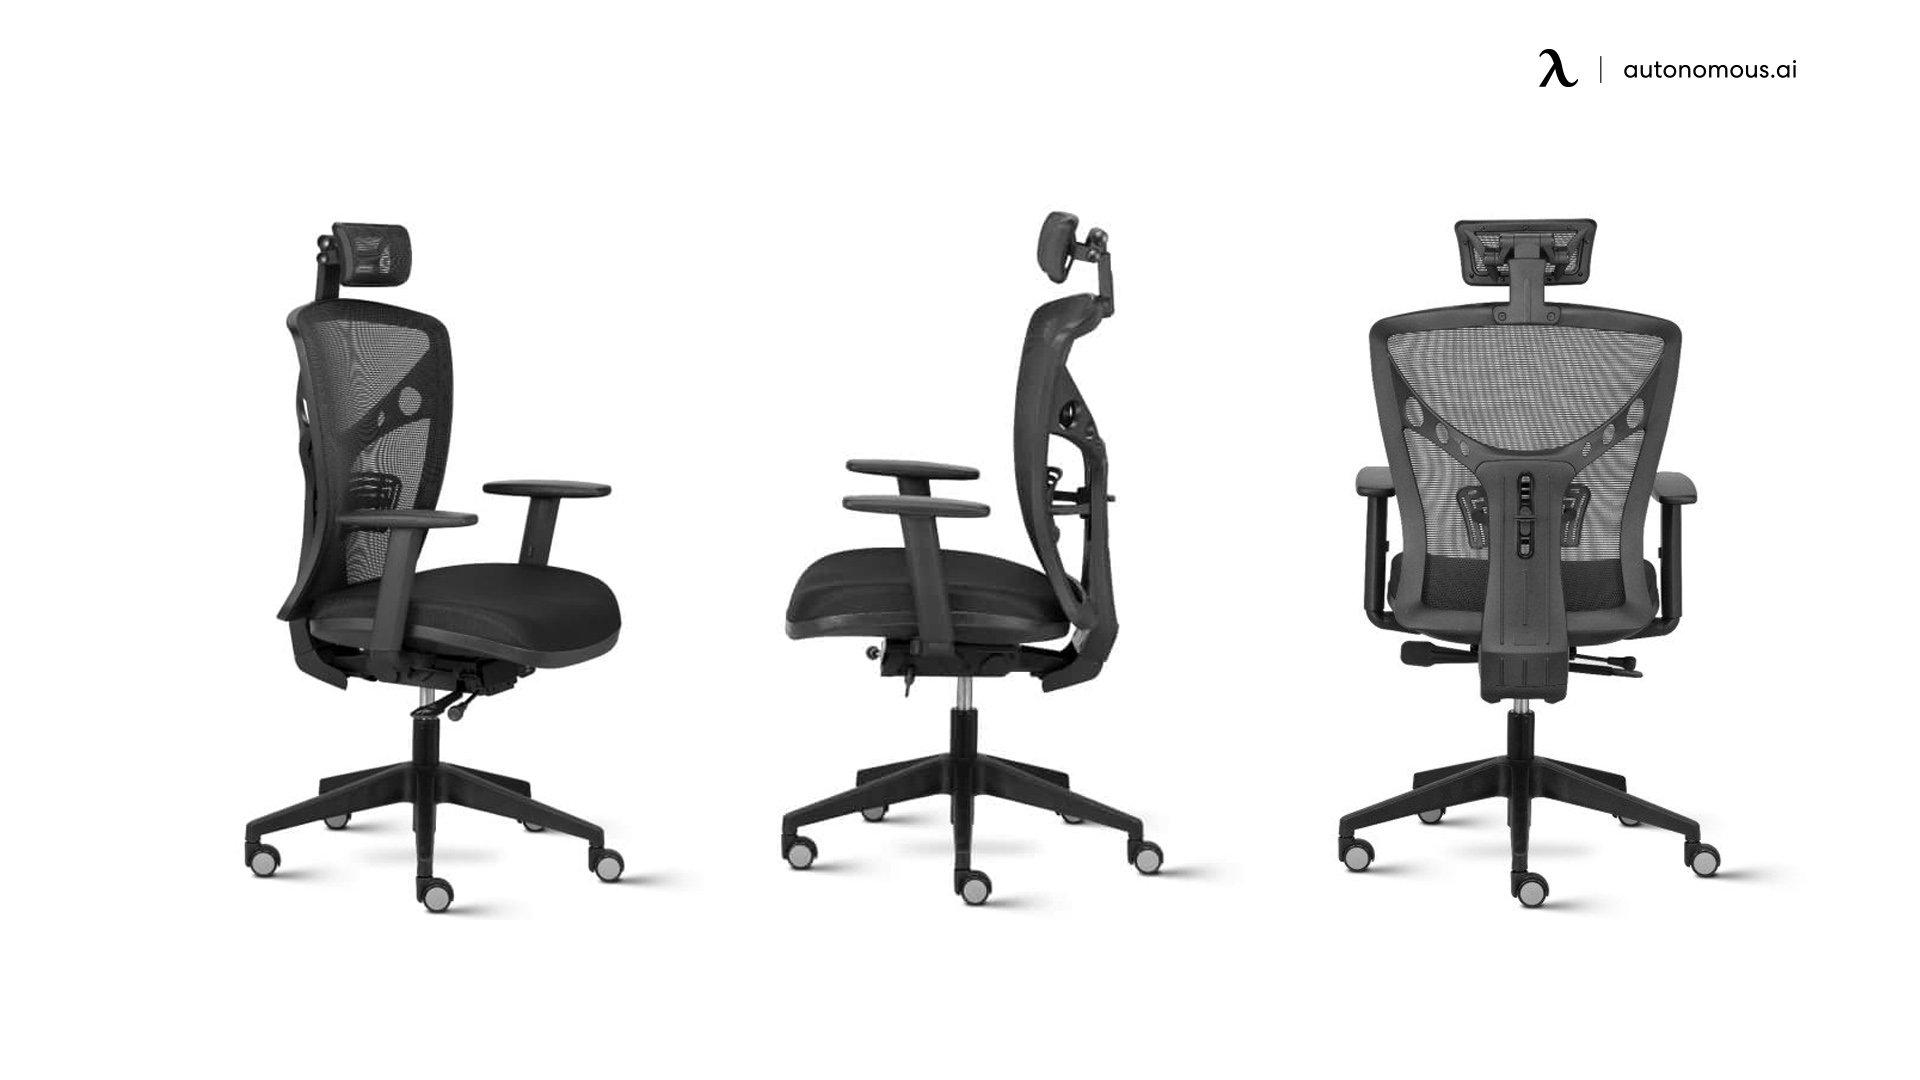 Volt High Back Ergonomic chair